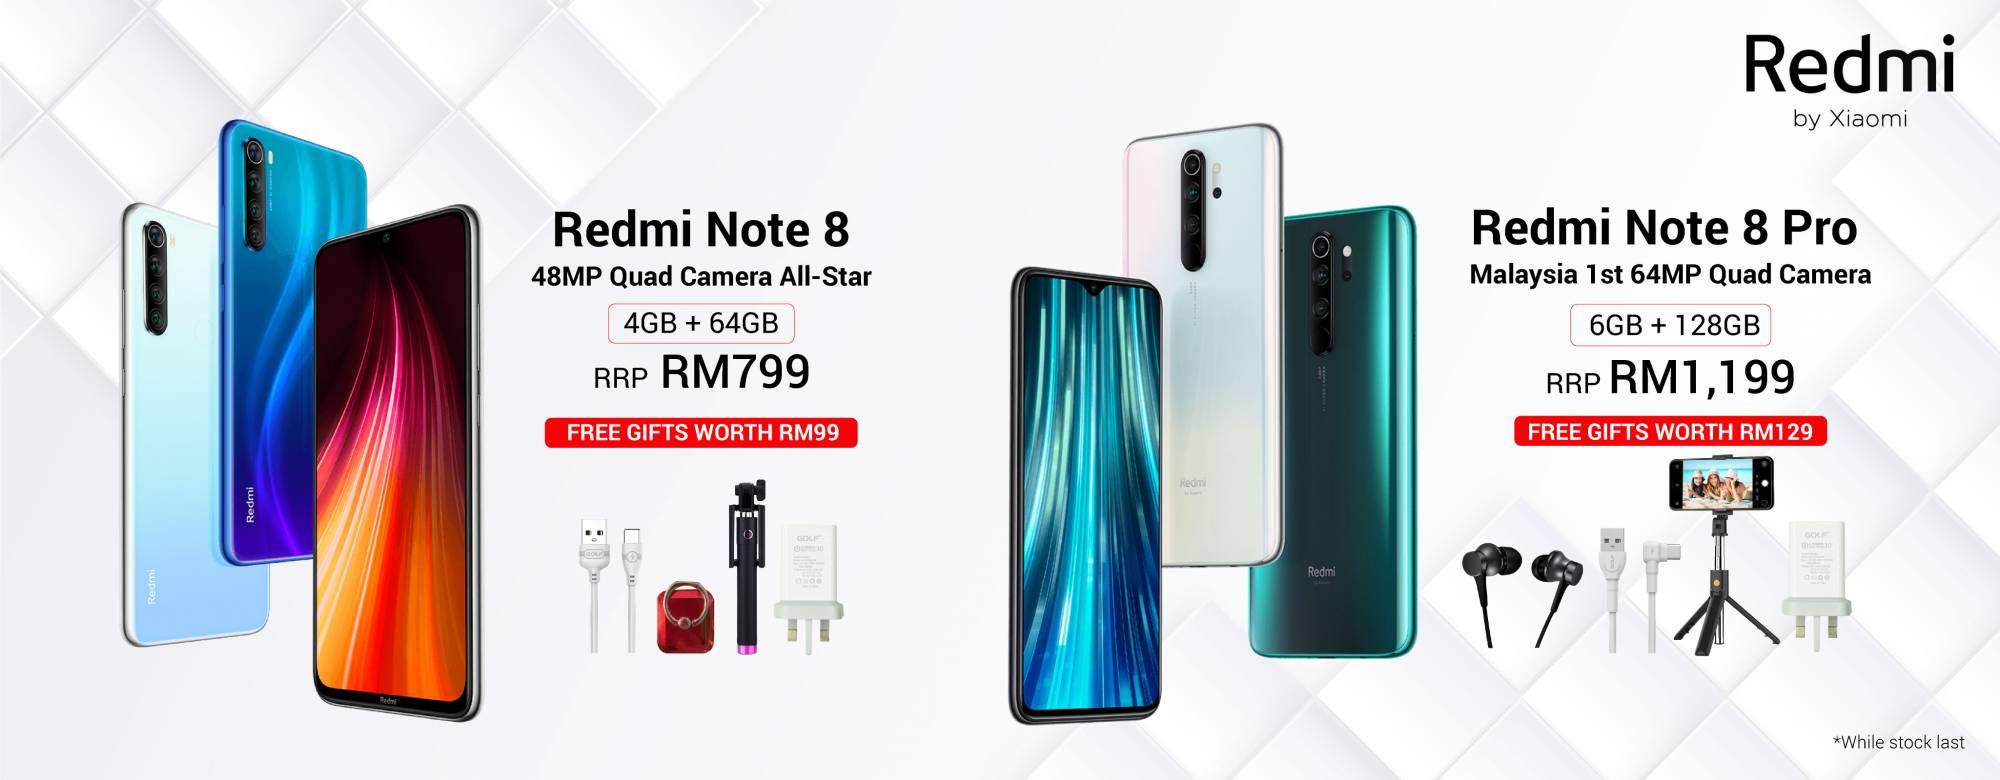 Xiaomi Redmi Note 8 & Note 8 Pro